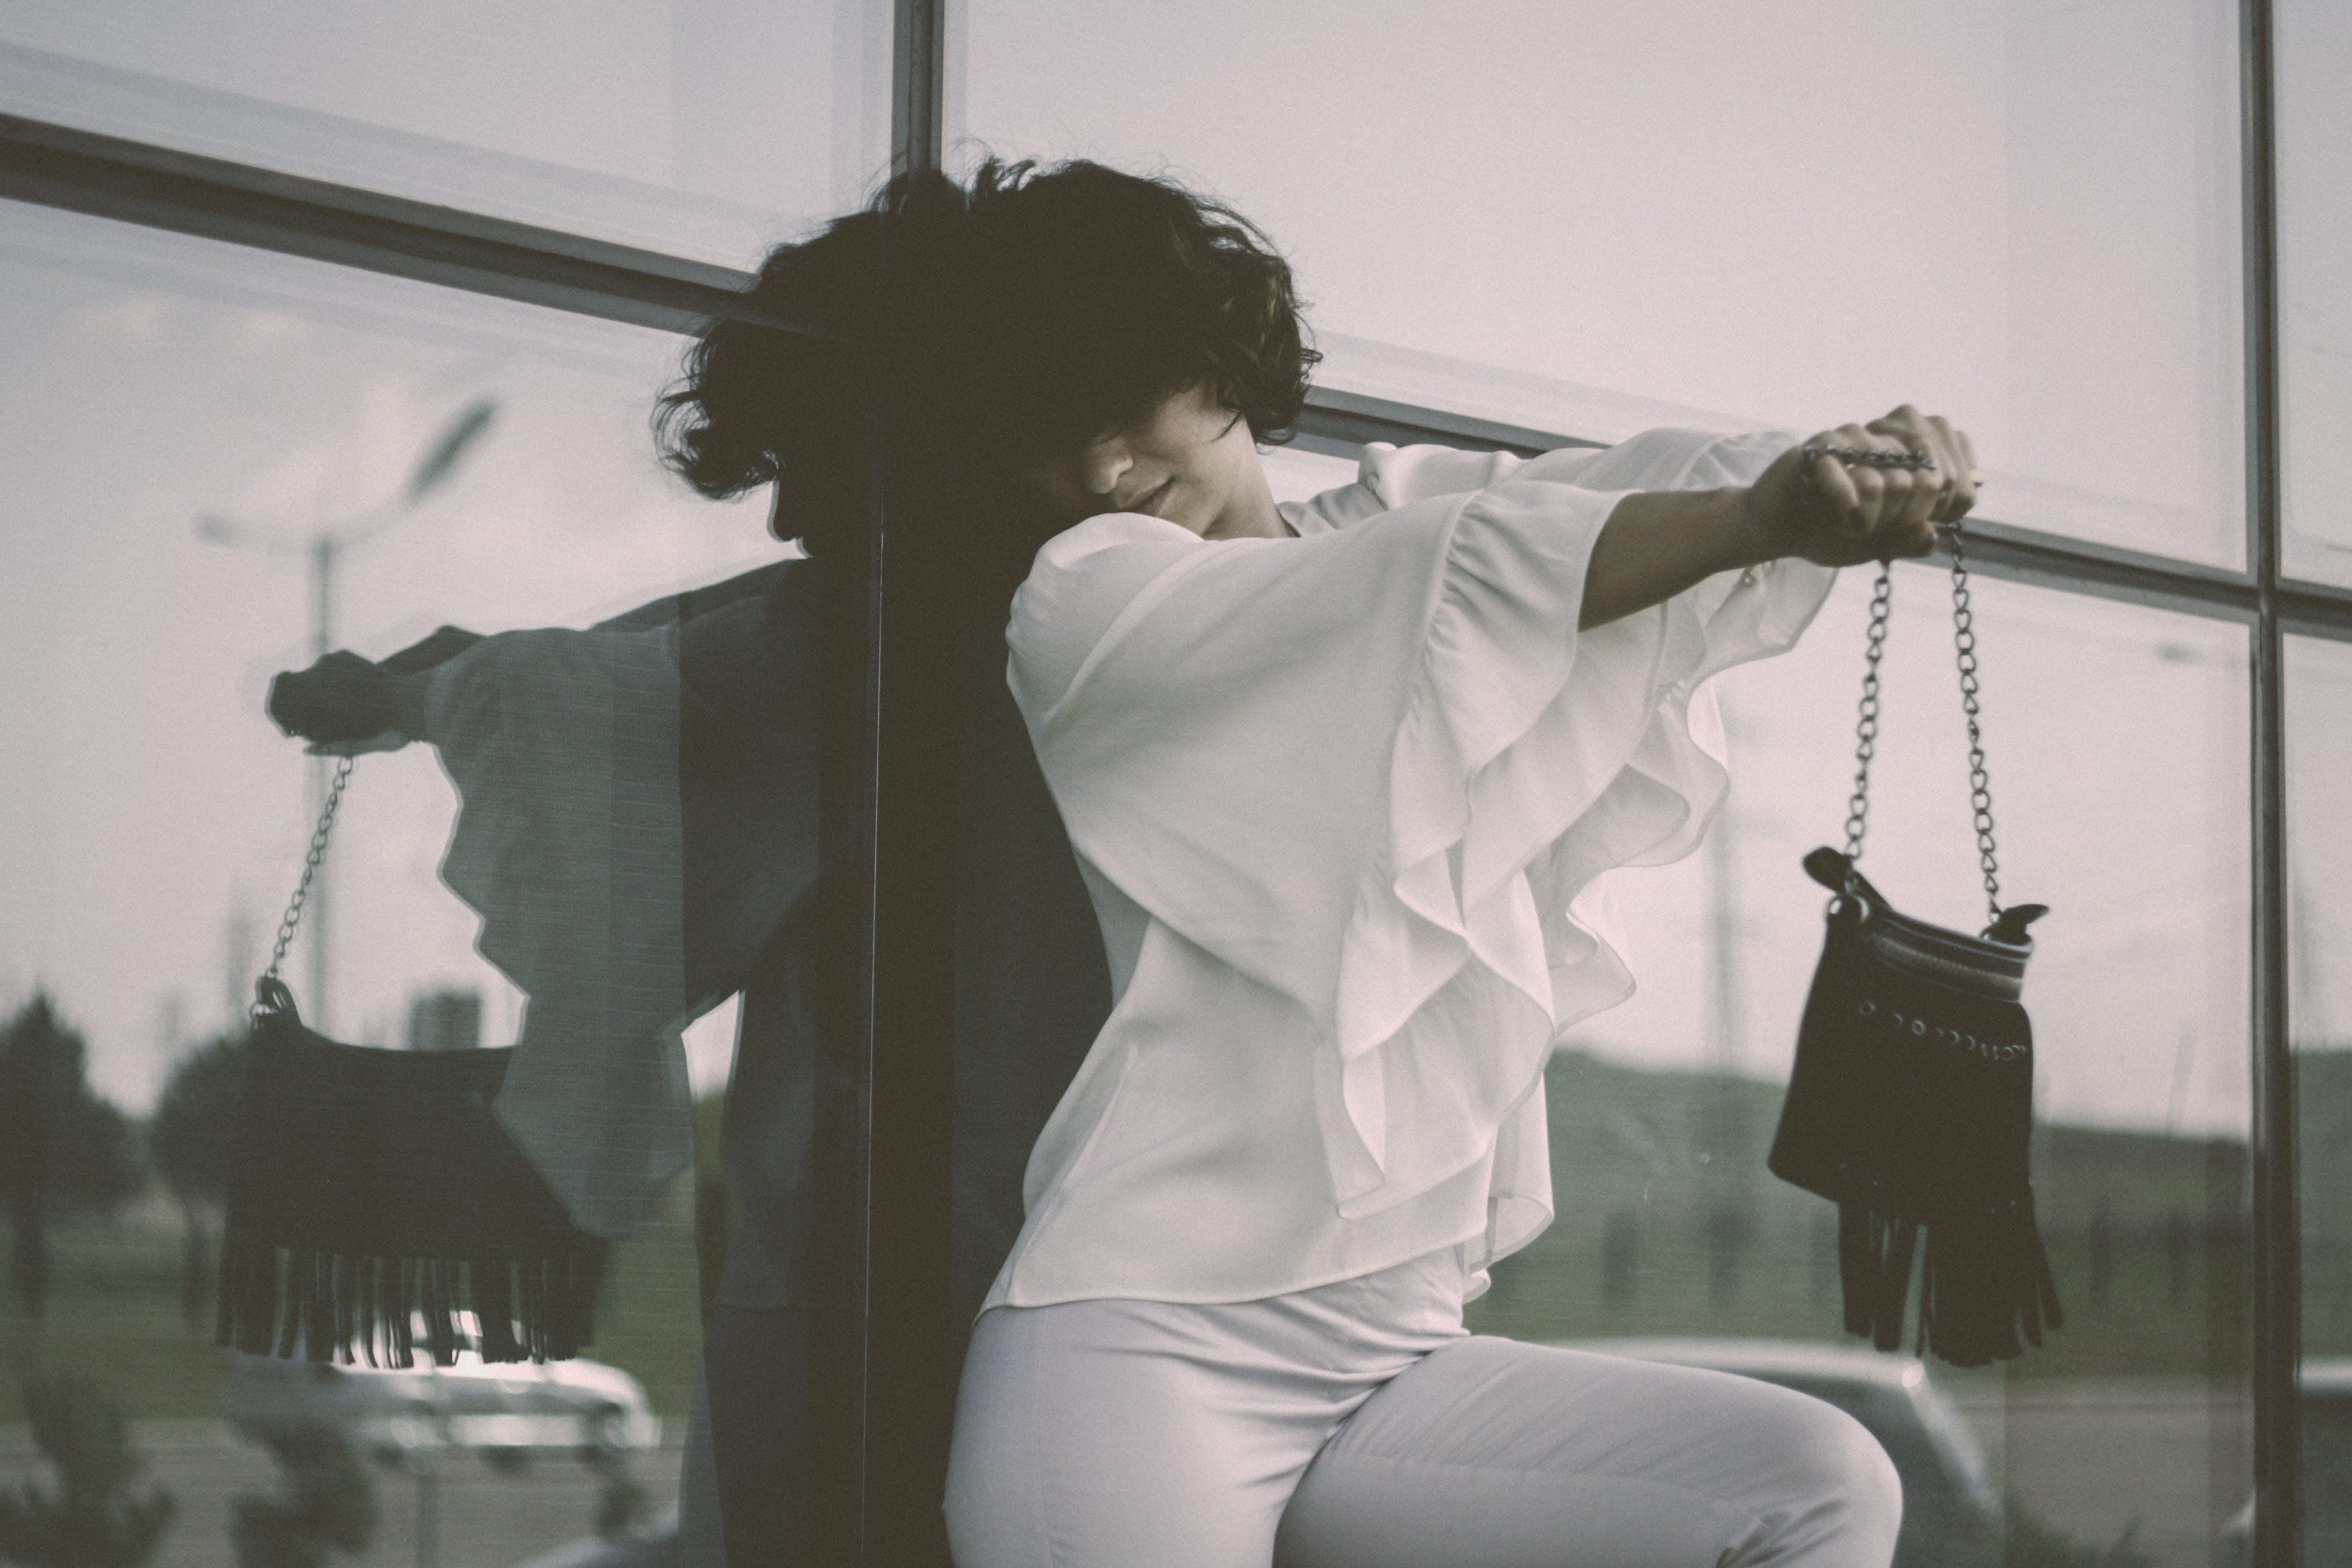 Woman Wearing White Long-sleeved Shirt